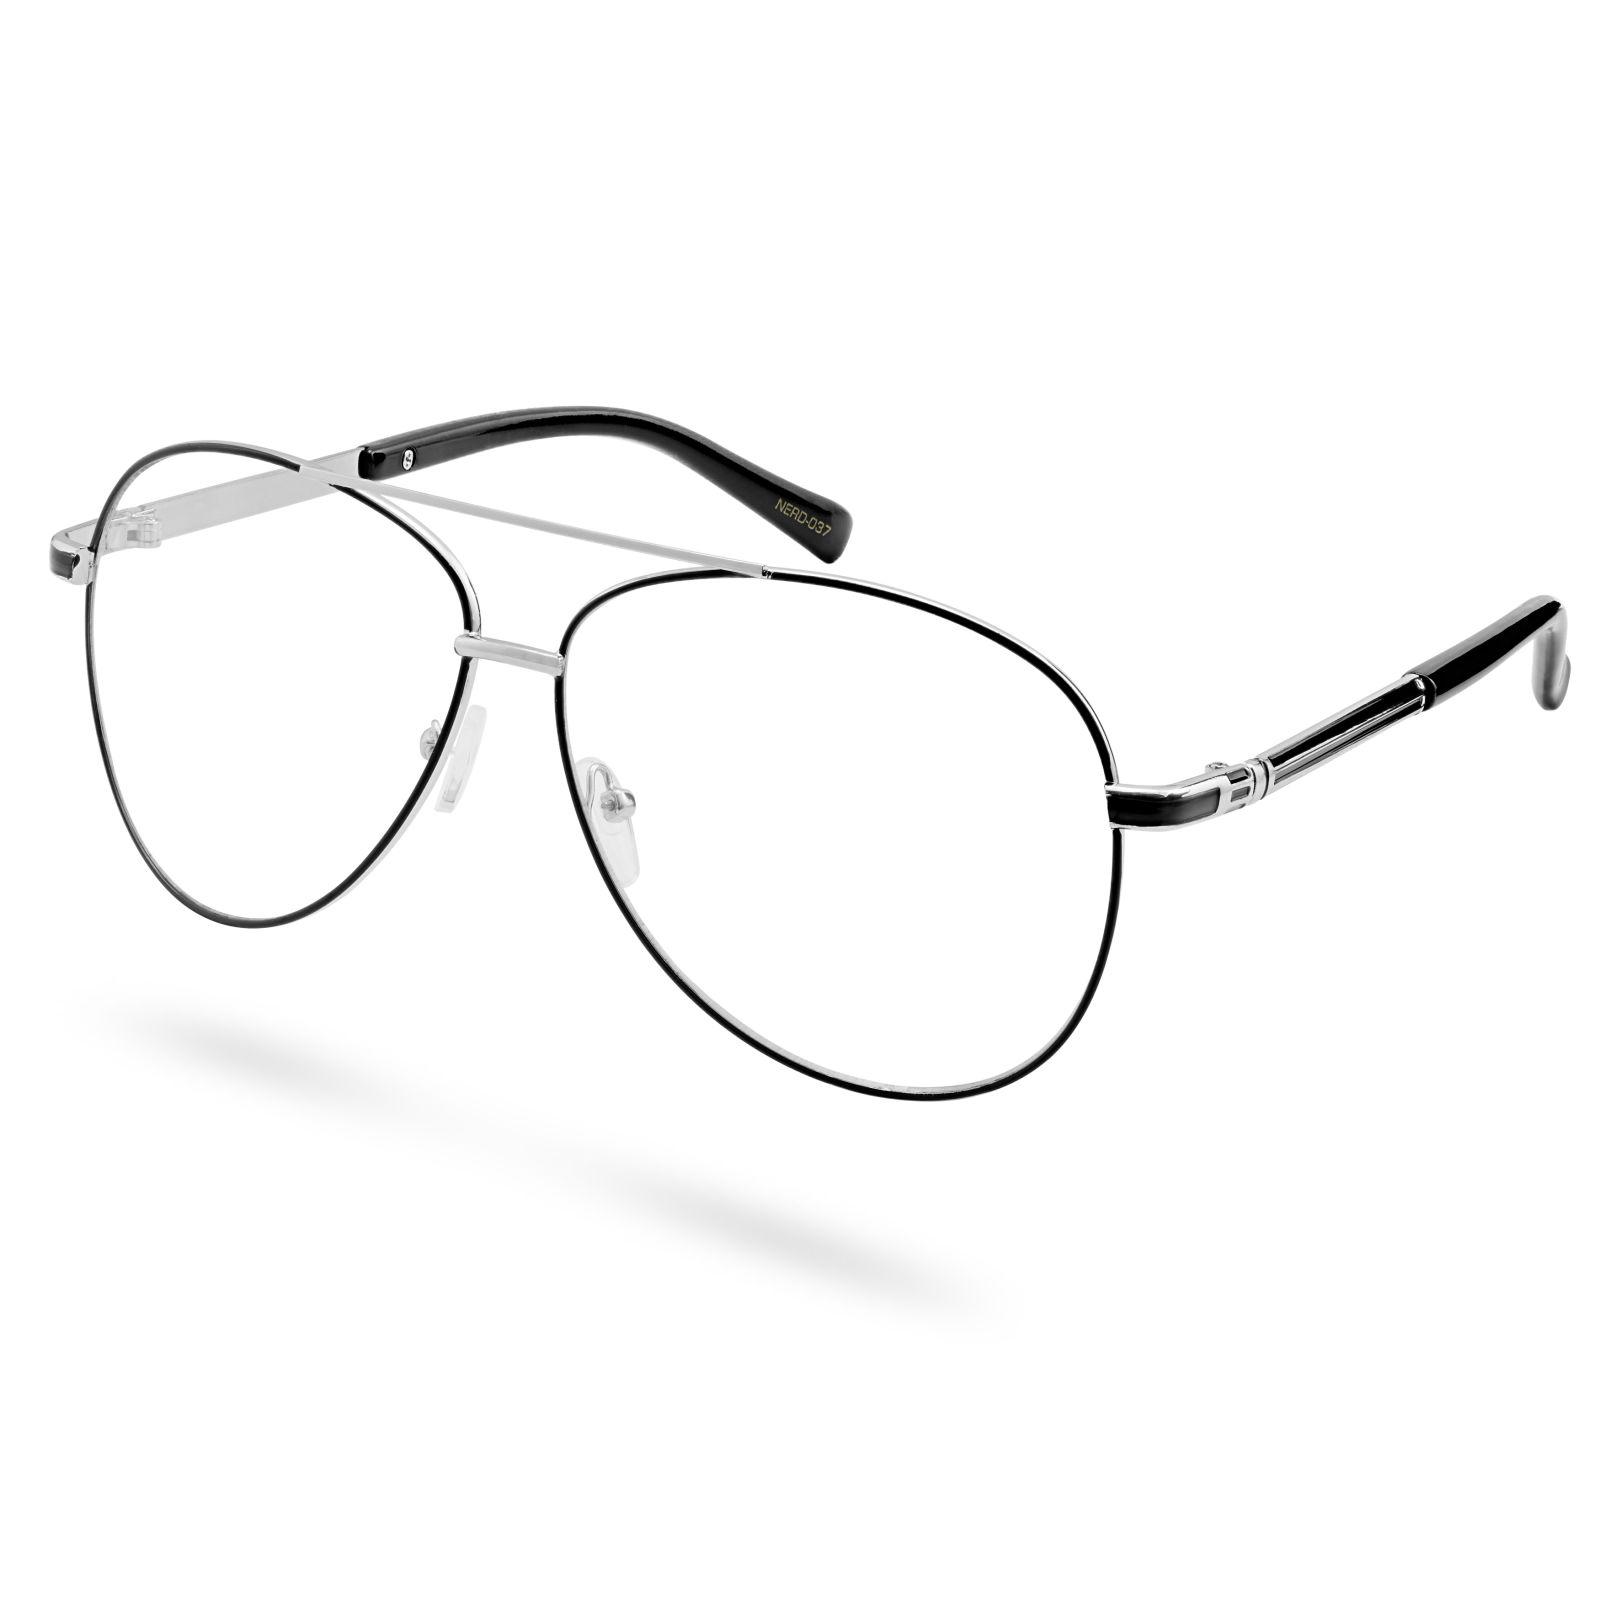 52d301adc66b Professorbriller med Sølvfarget og Svart Innfatning